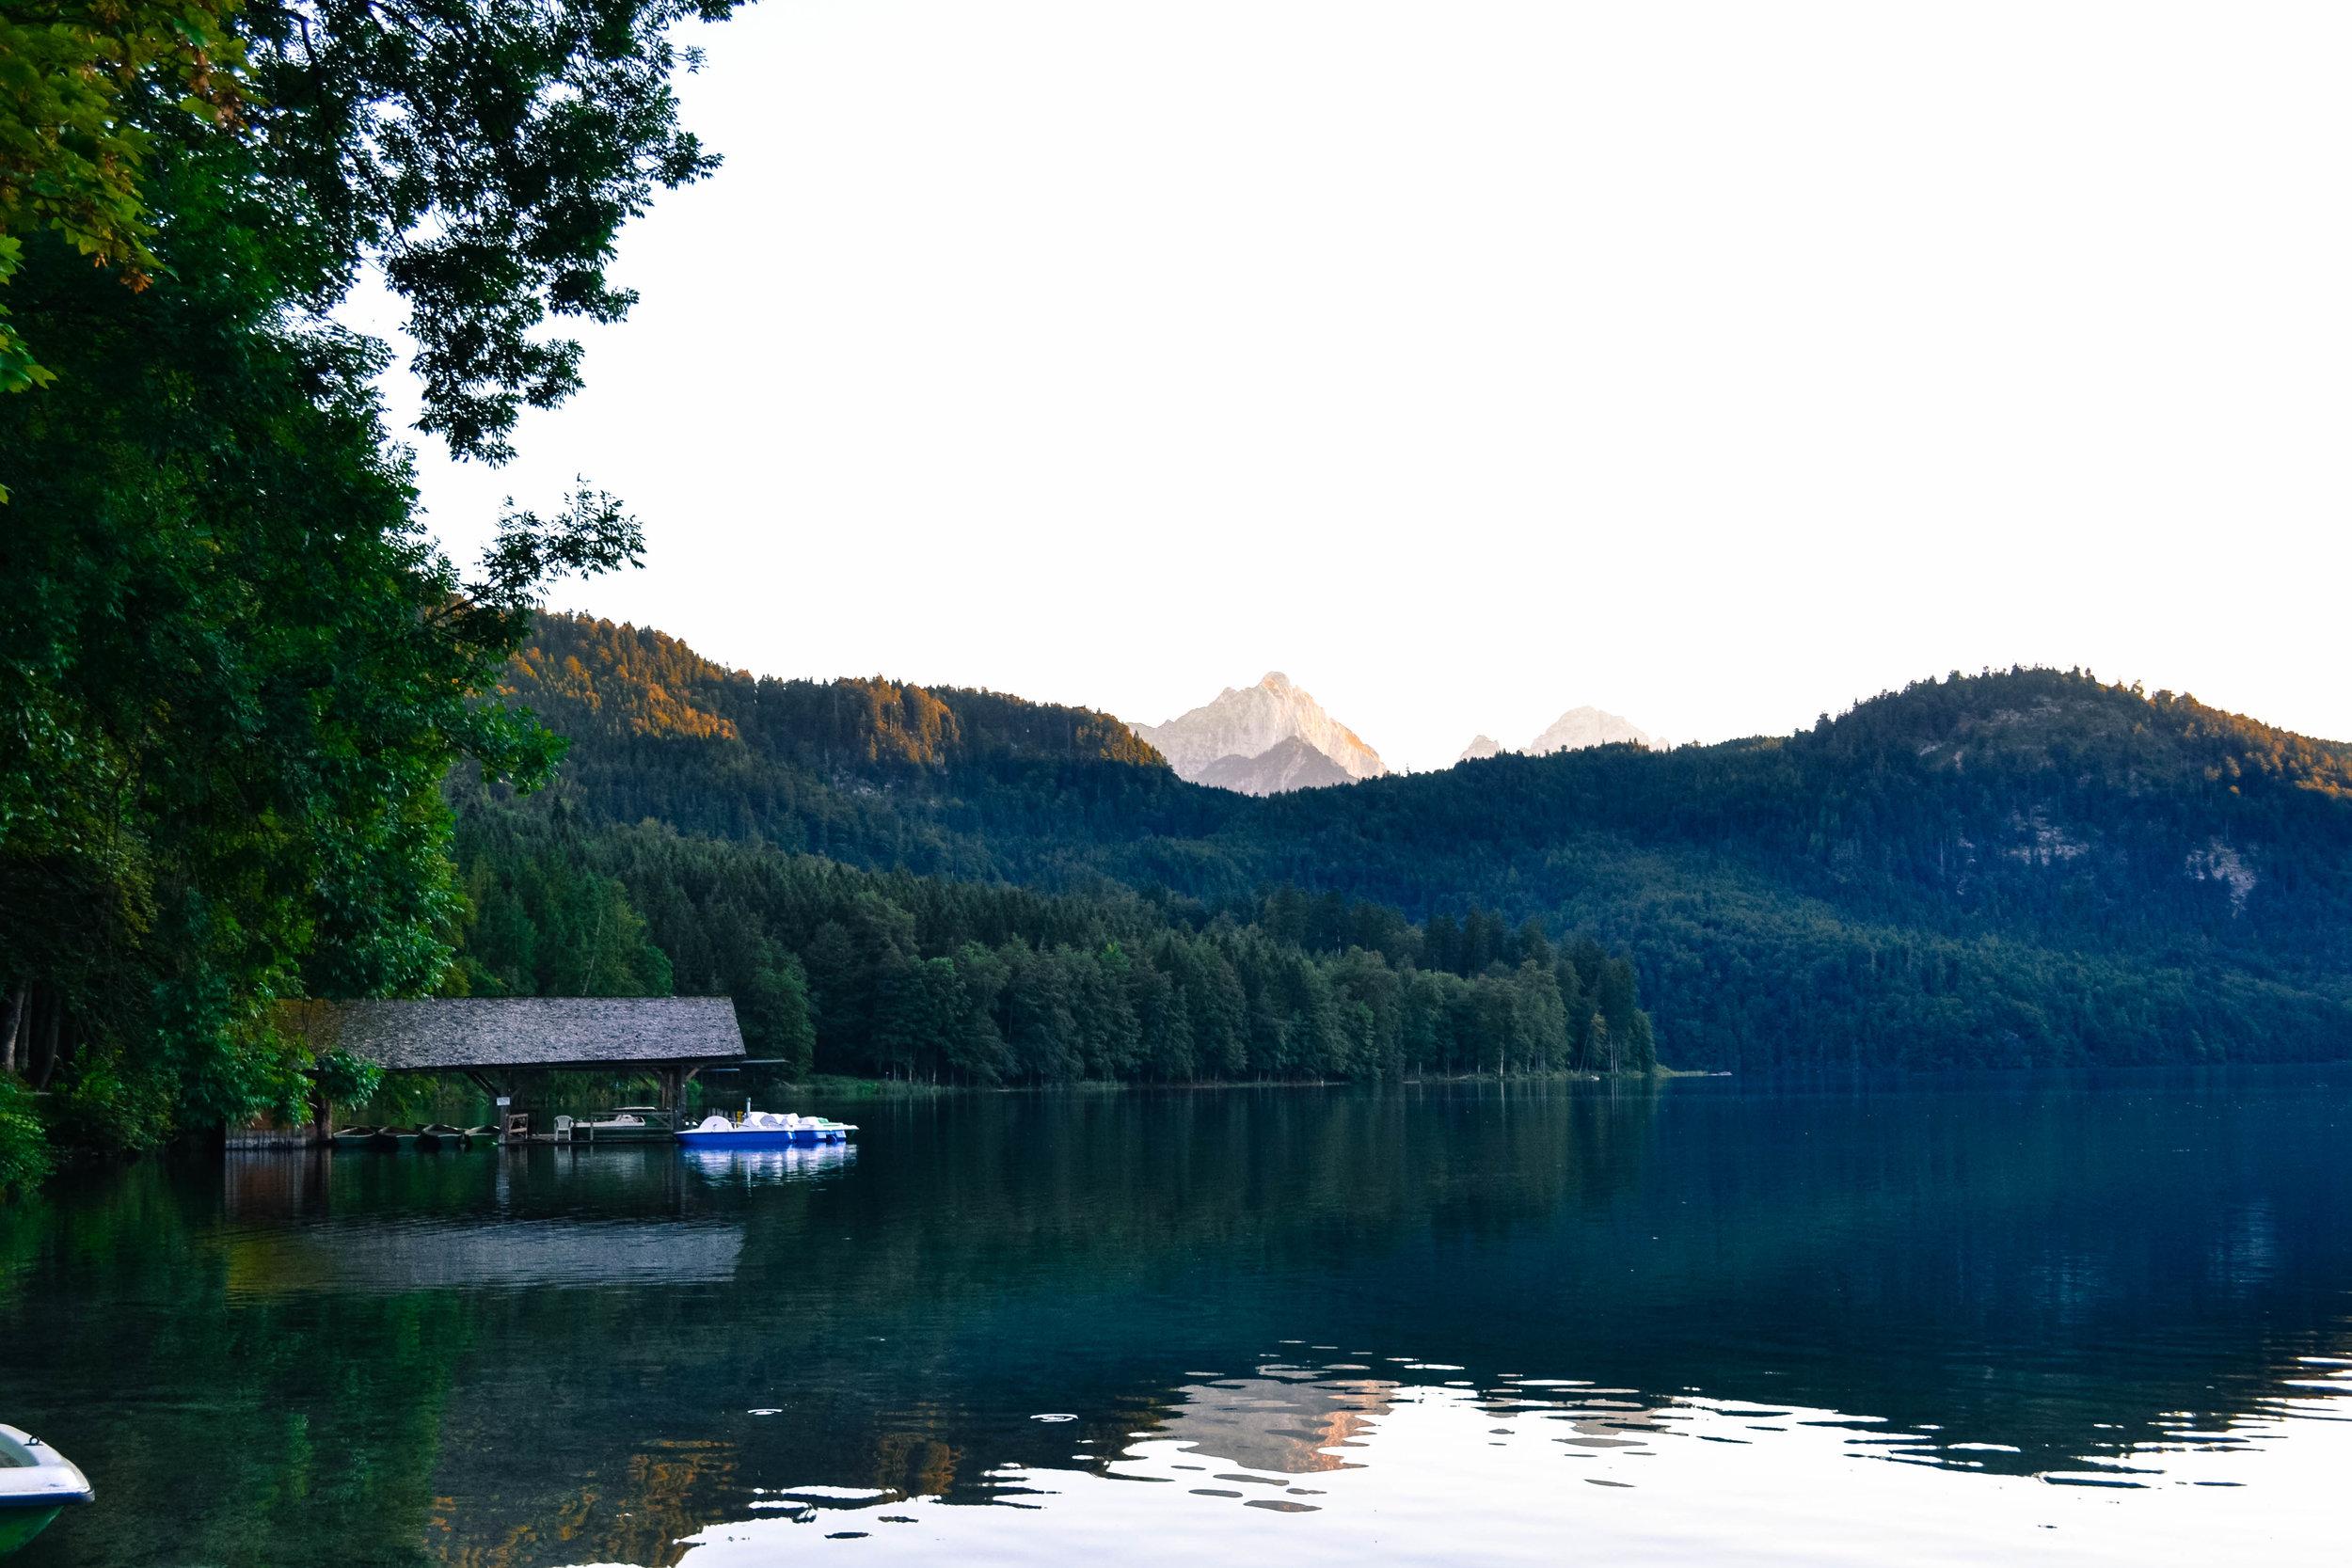 Swan Lake, Germany